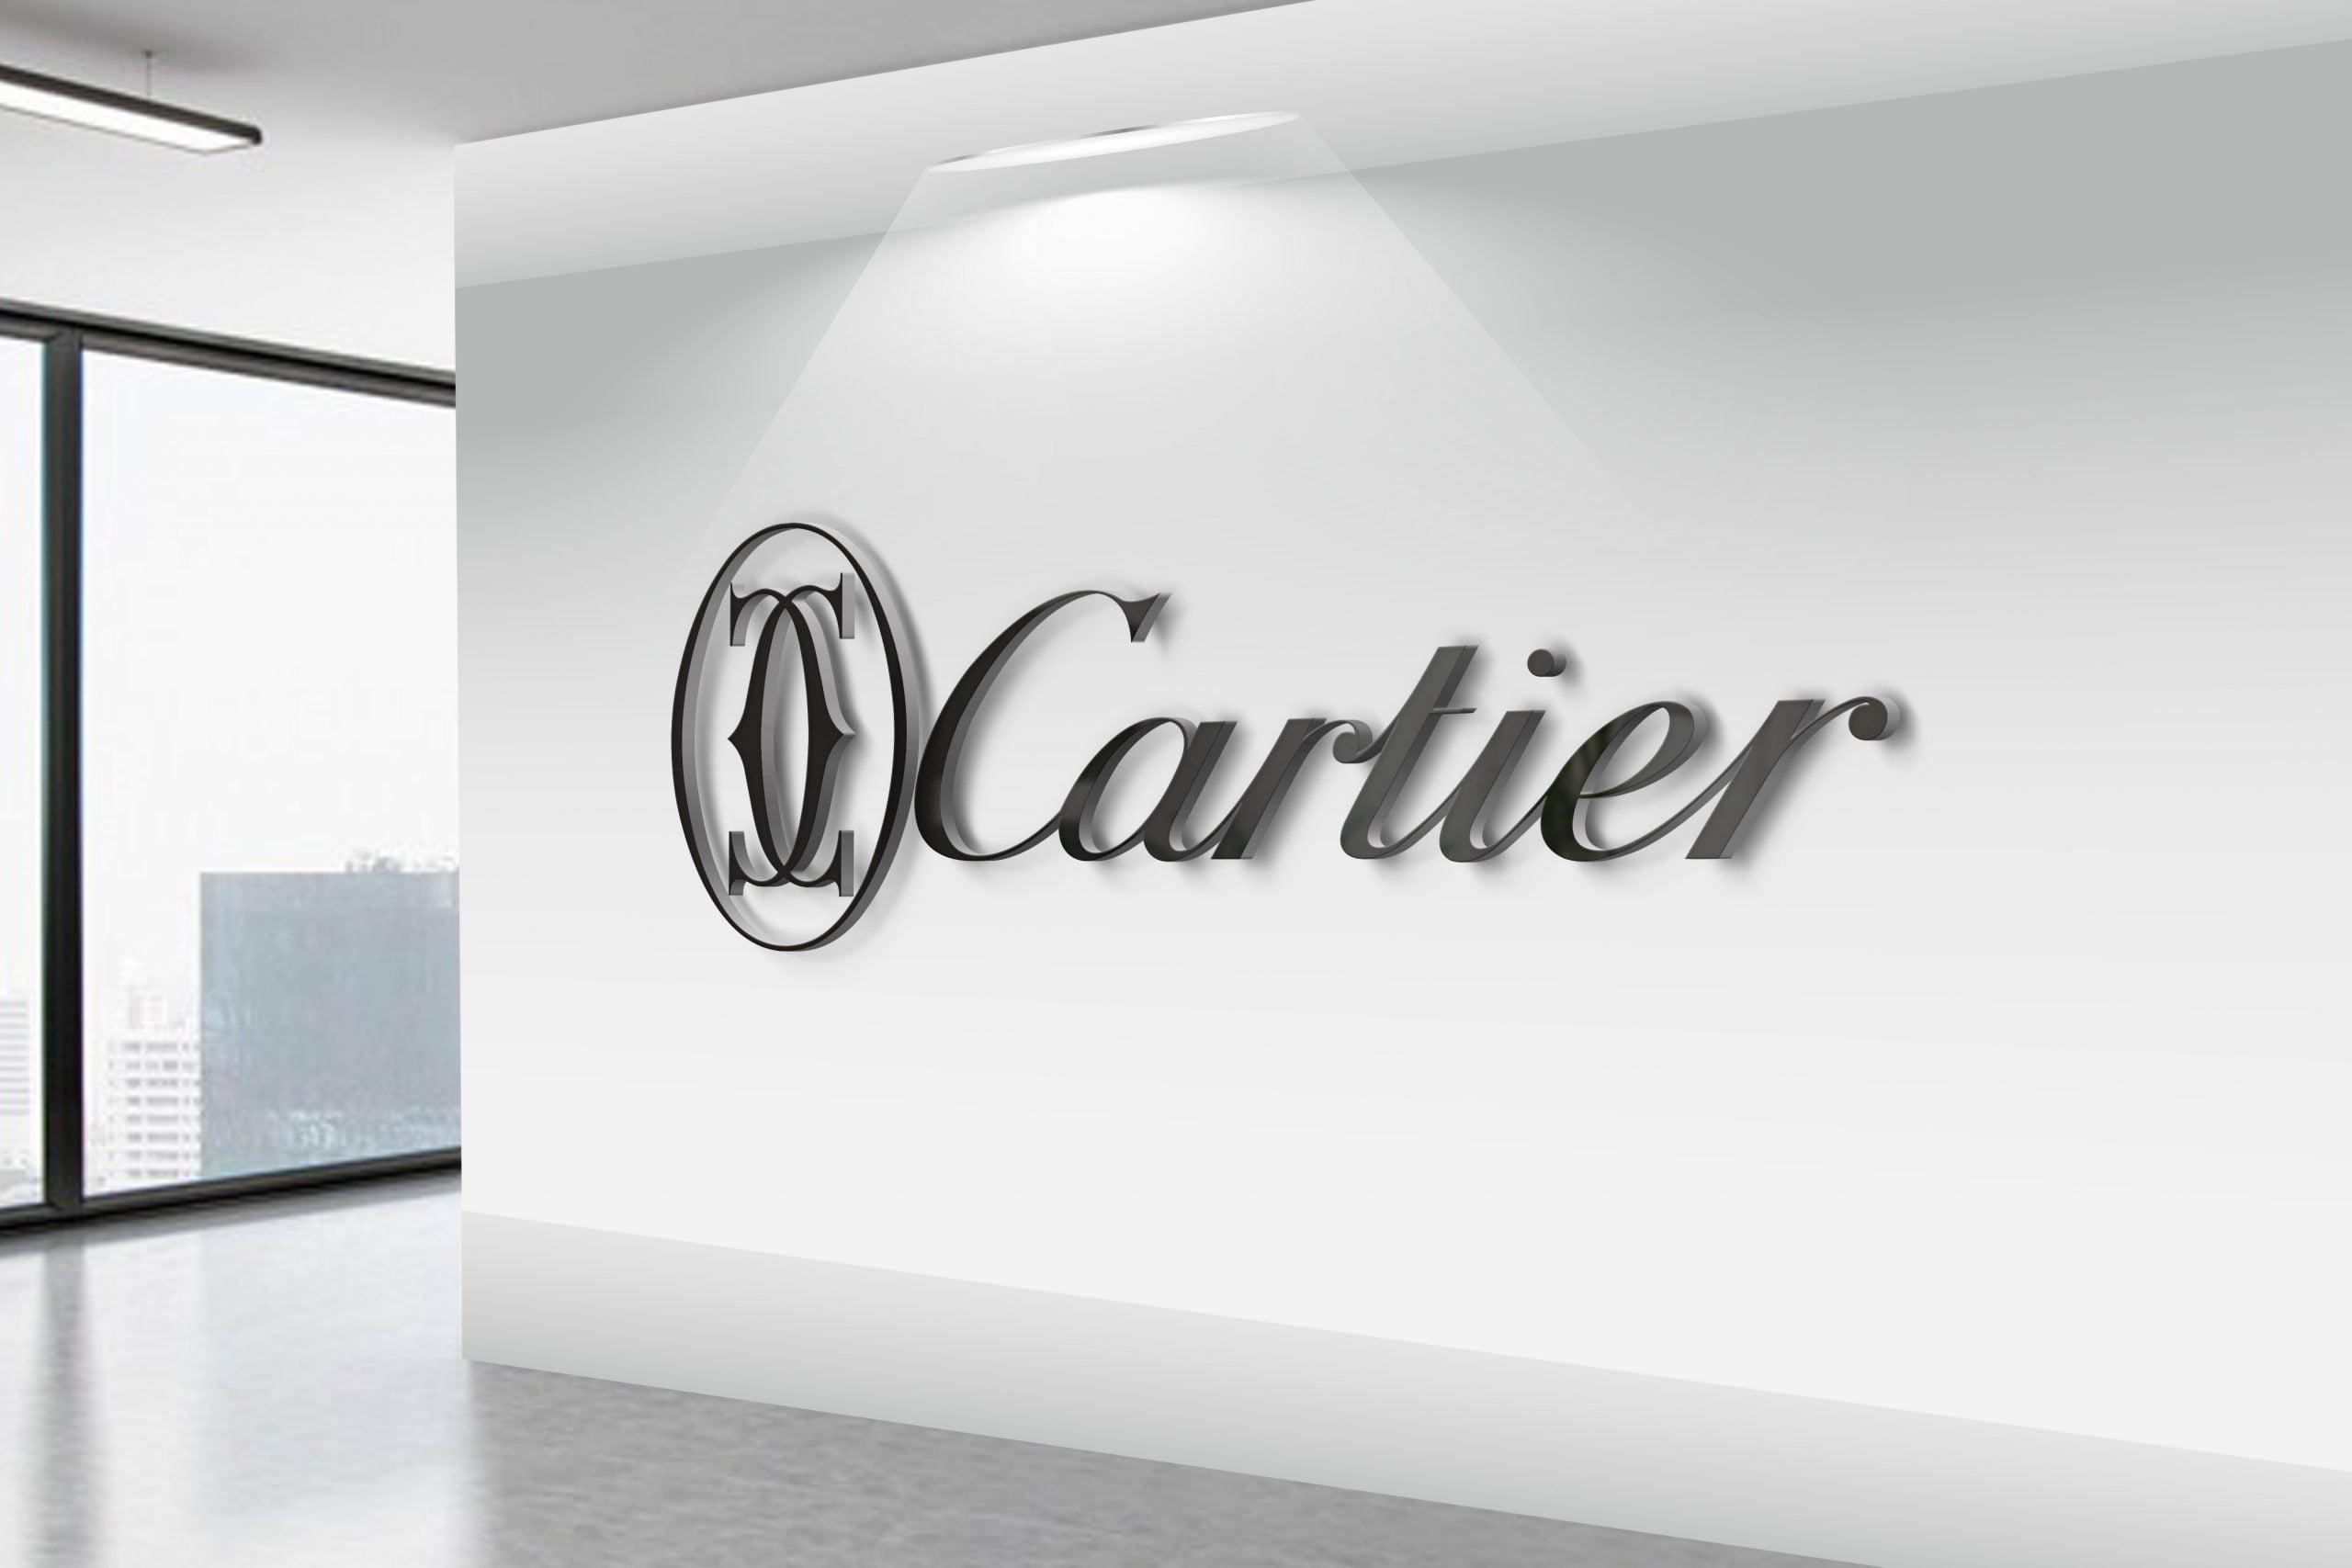 Cartier-3D-Wall-Logo-MockUp